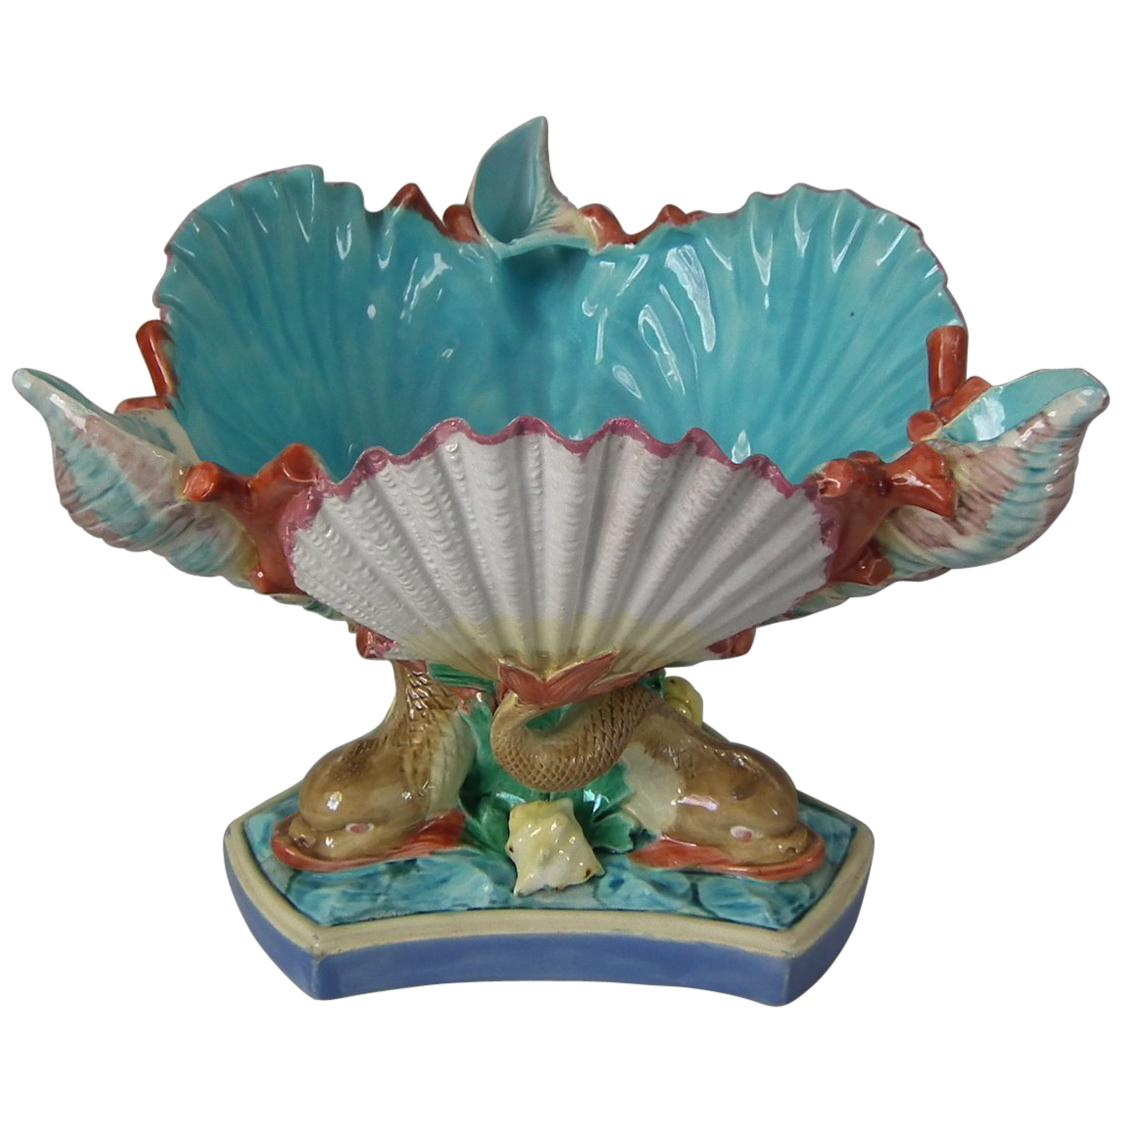 Royal Worcester Majolica Centrepiece Bowl